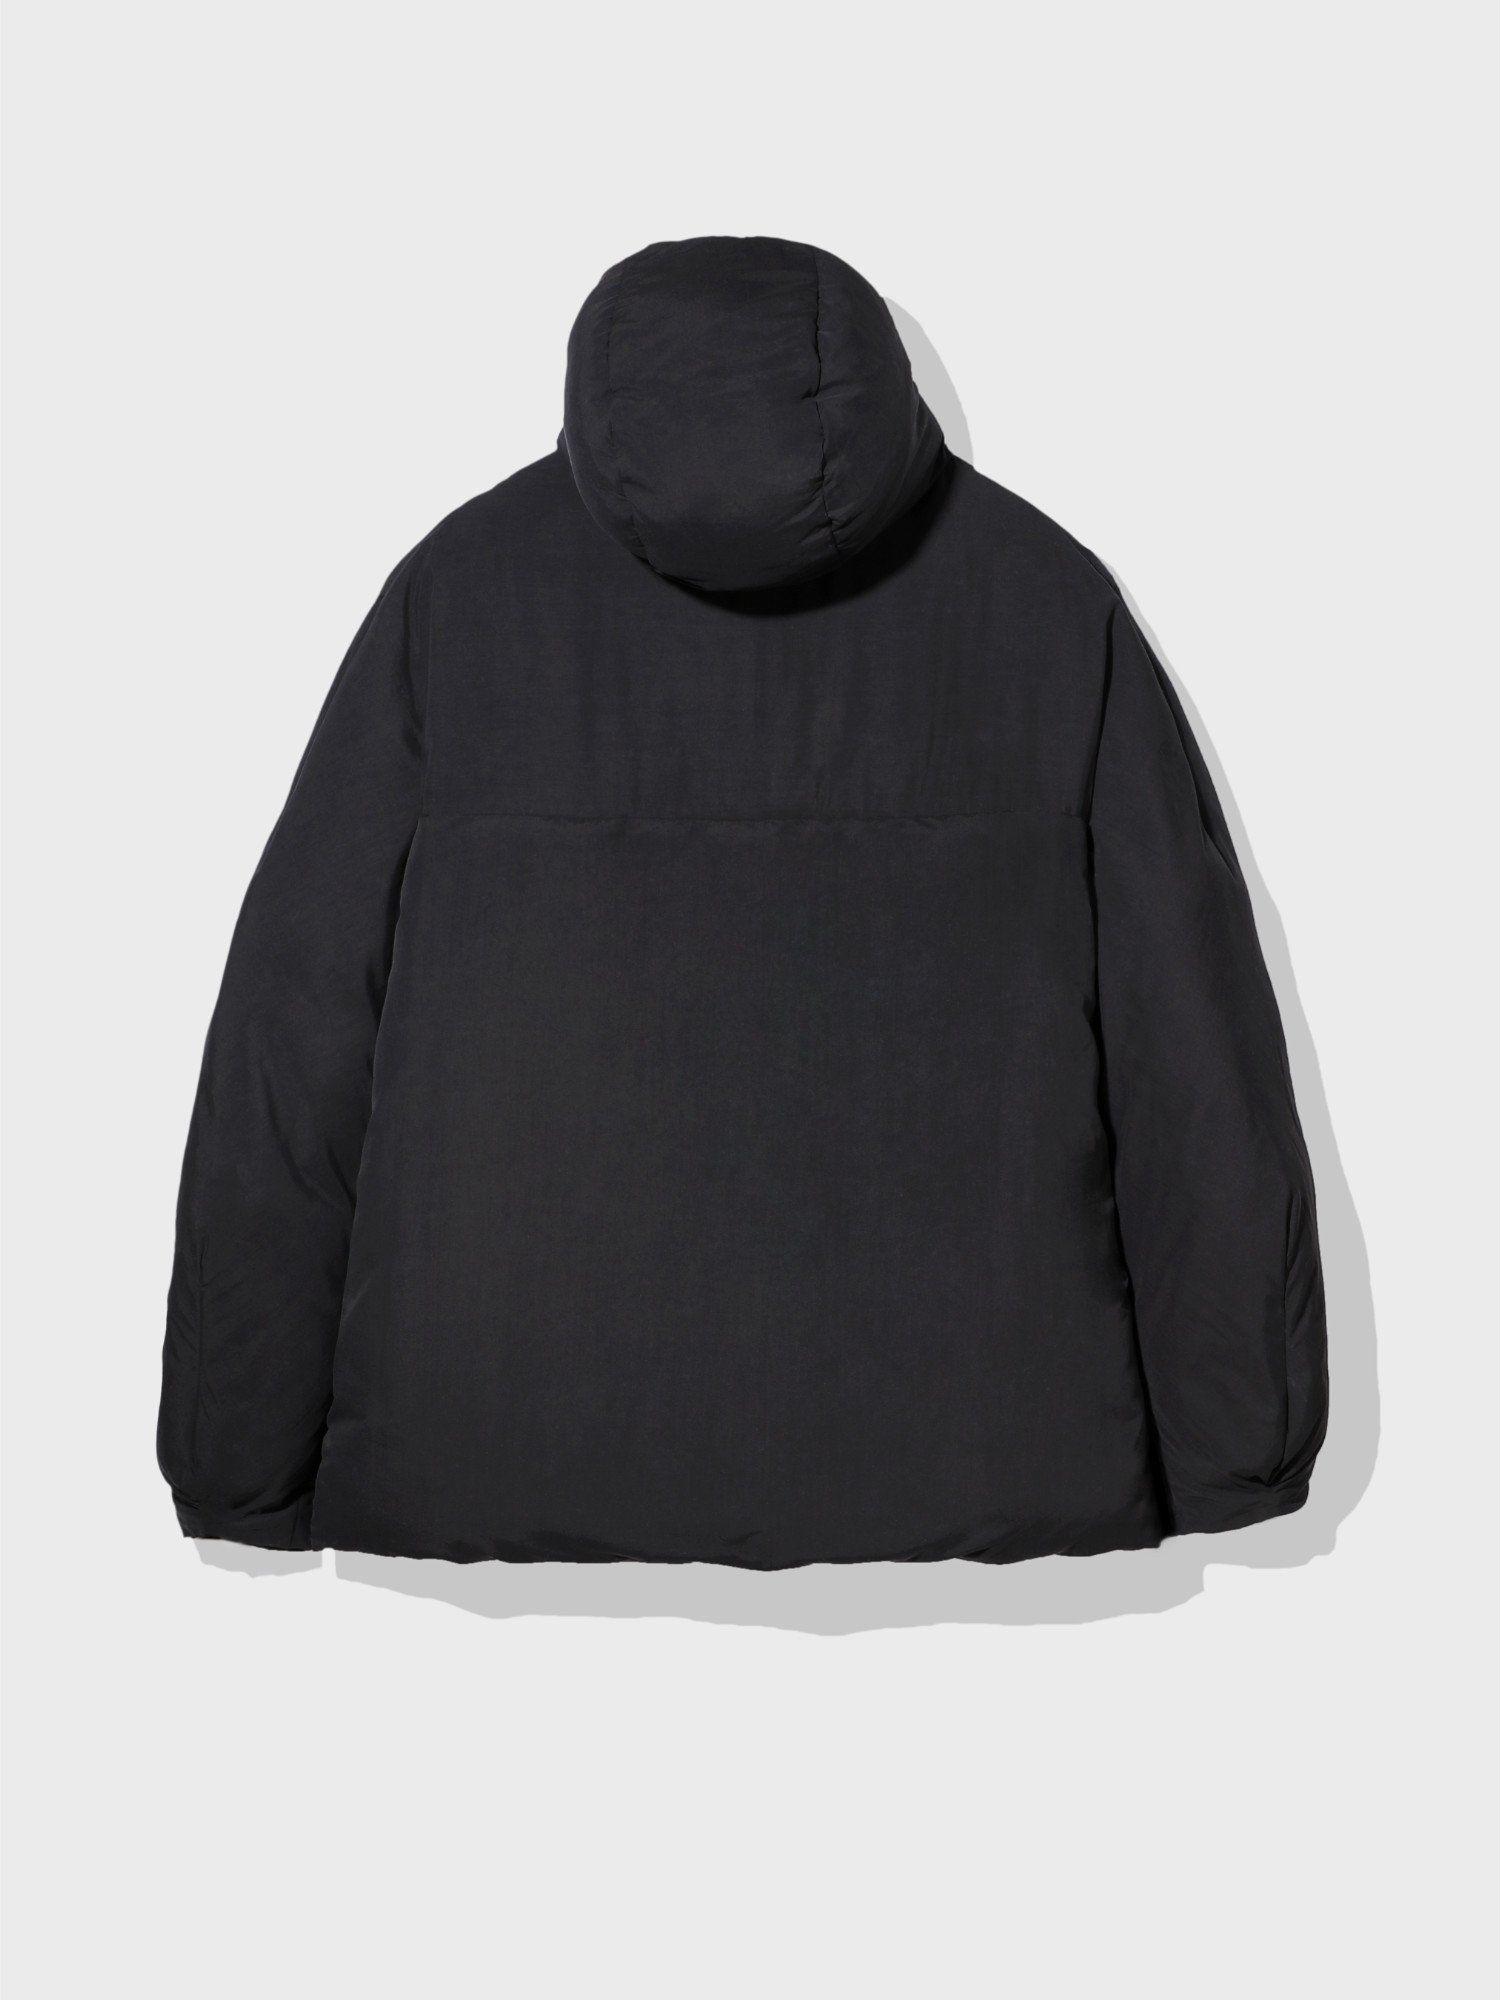 Puffer Jacket Short Black Pangaia Puffer Coat Puffer Jackets Puffer [ 2000 x 1501 Pixel ]